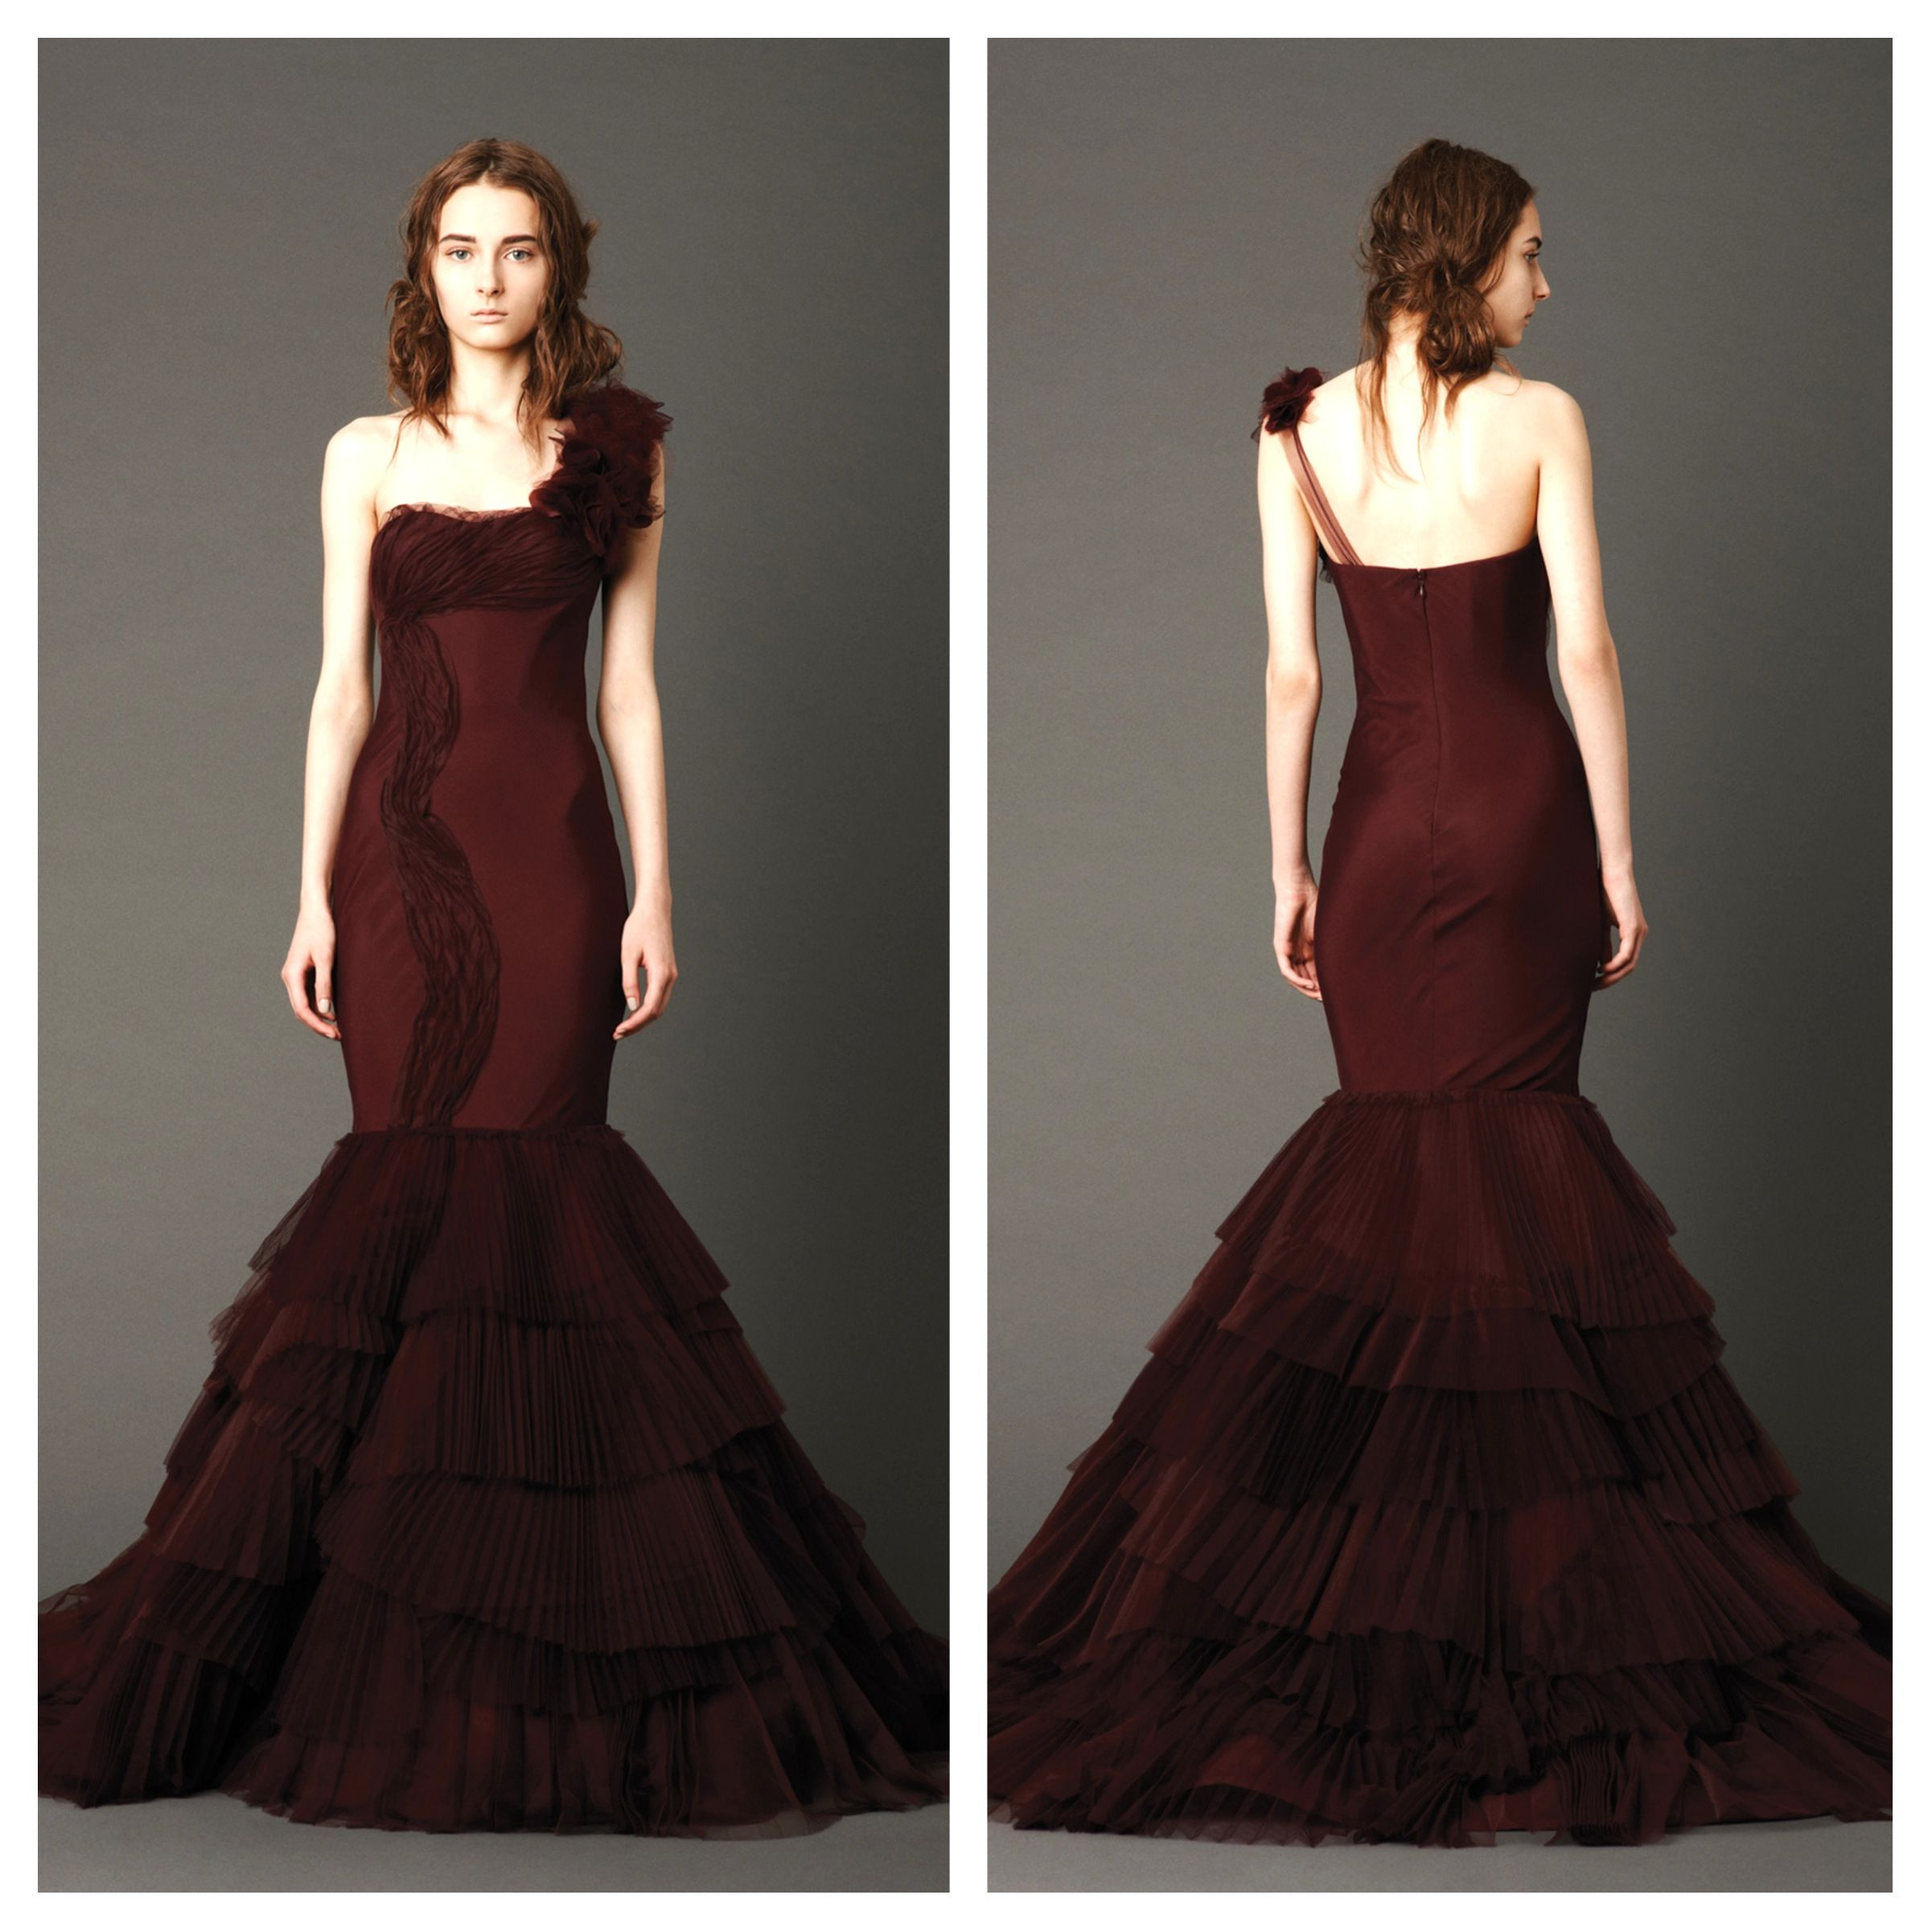 Vera-Wang-Red-Wedding-Dresses-2013-Kaye.jpg (2402×2402) | Red ...